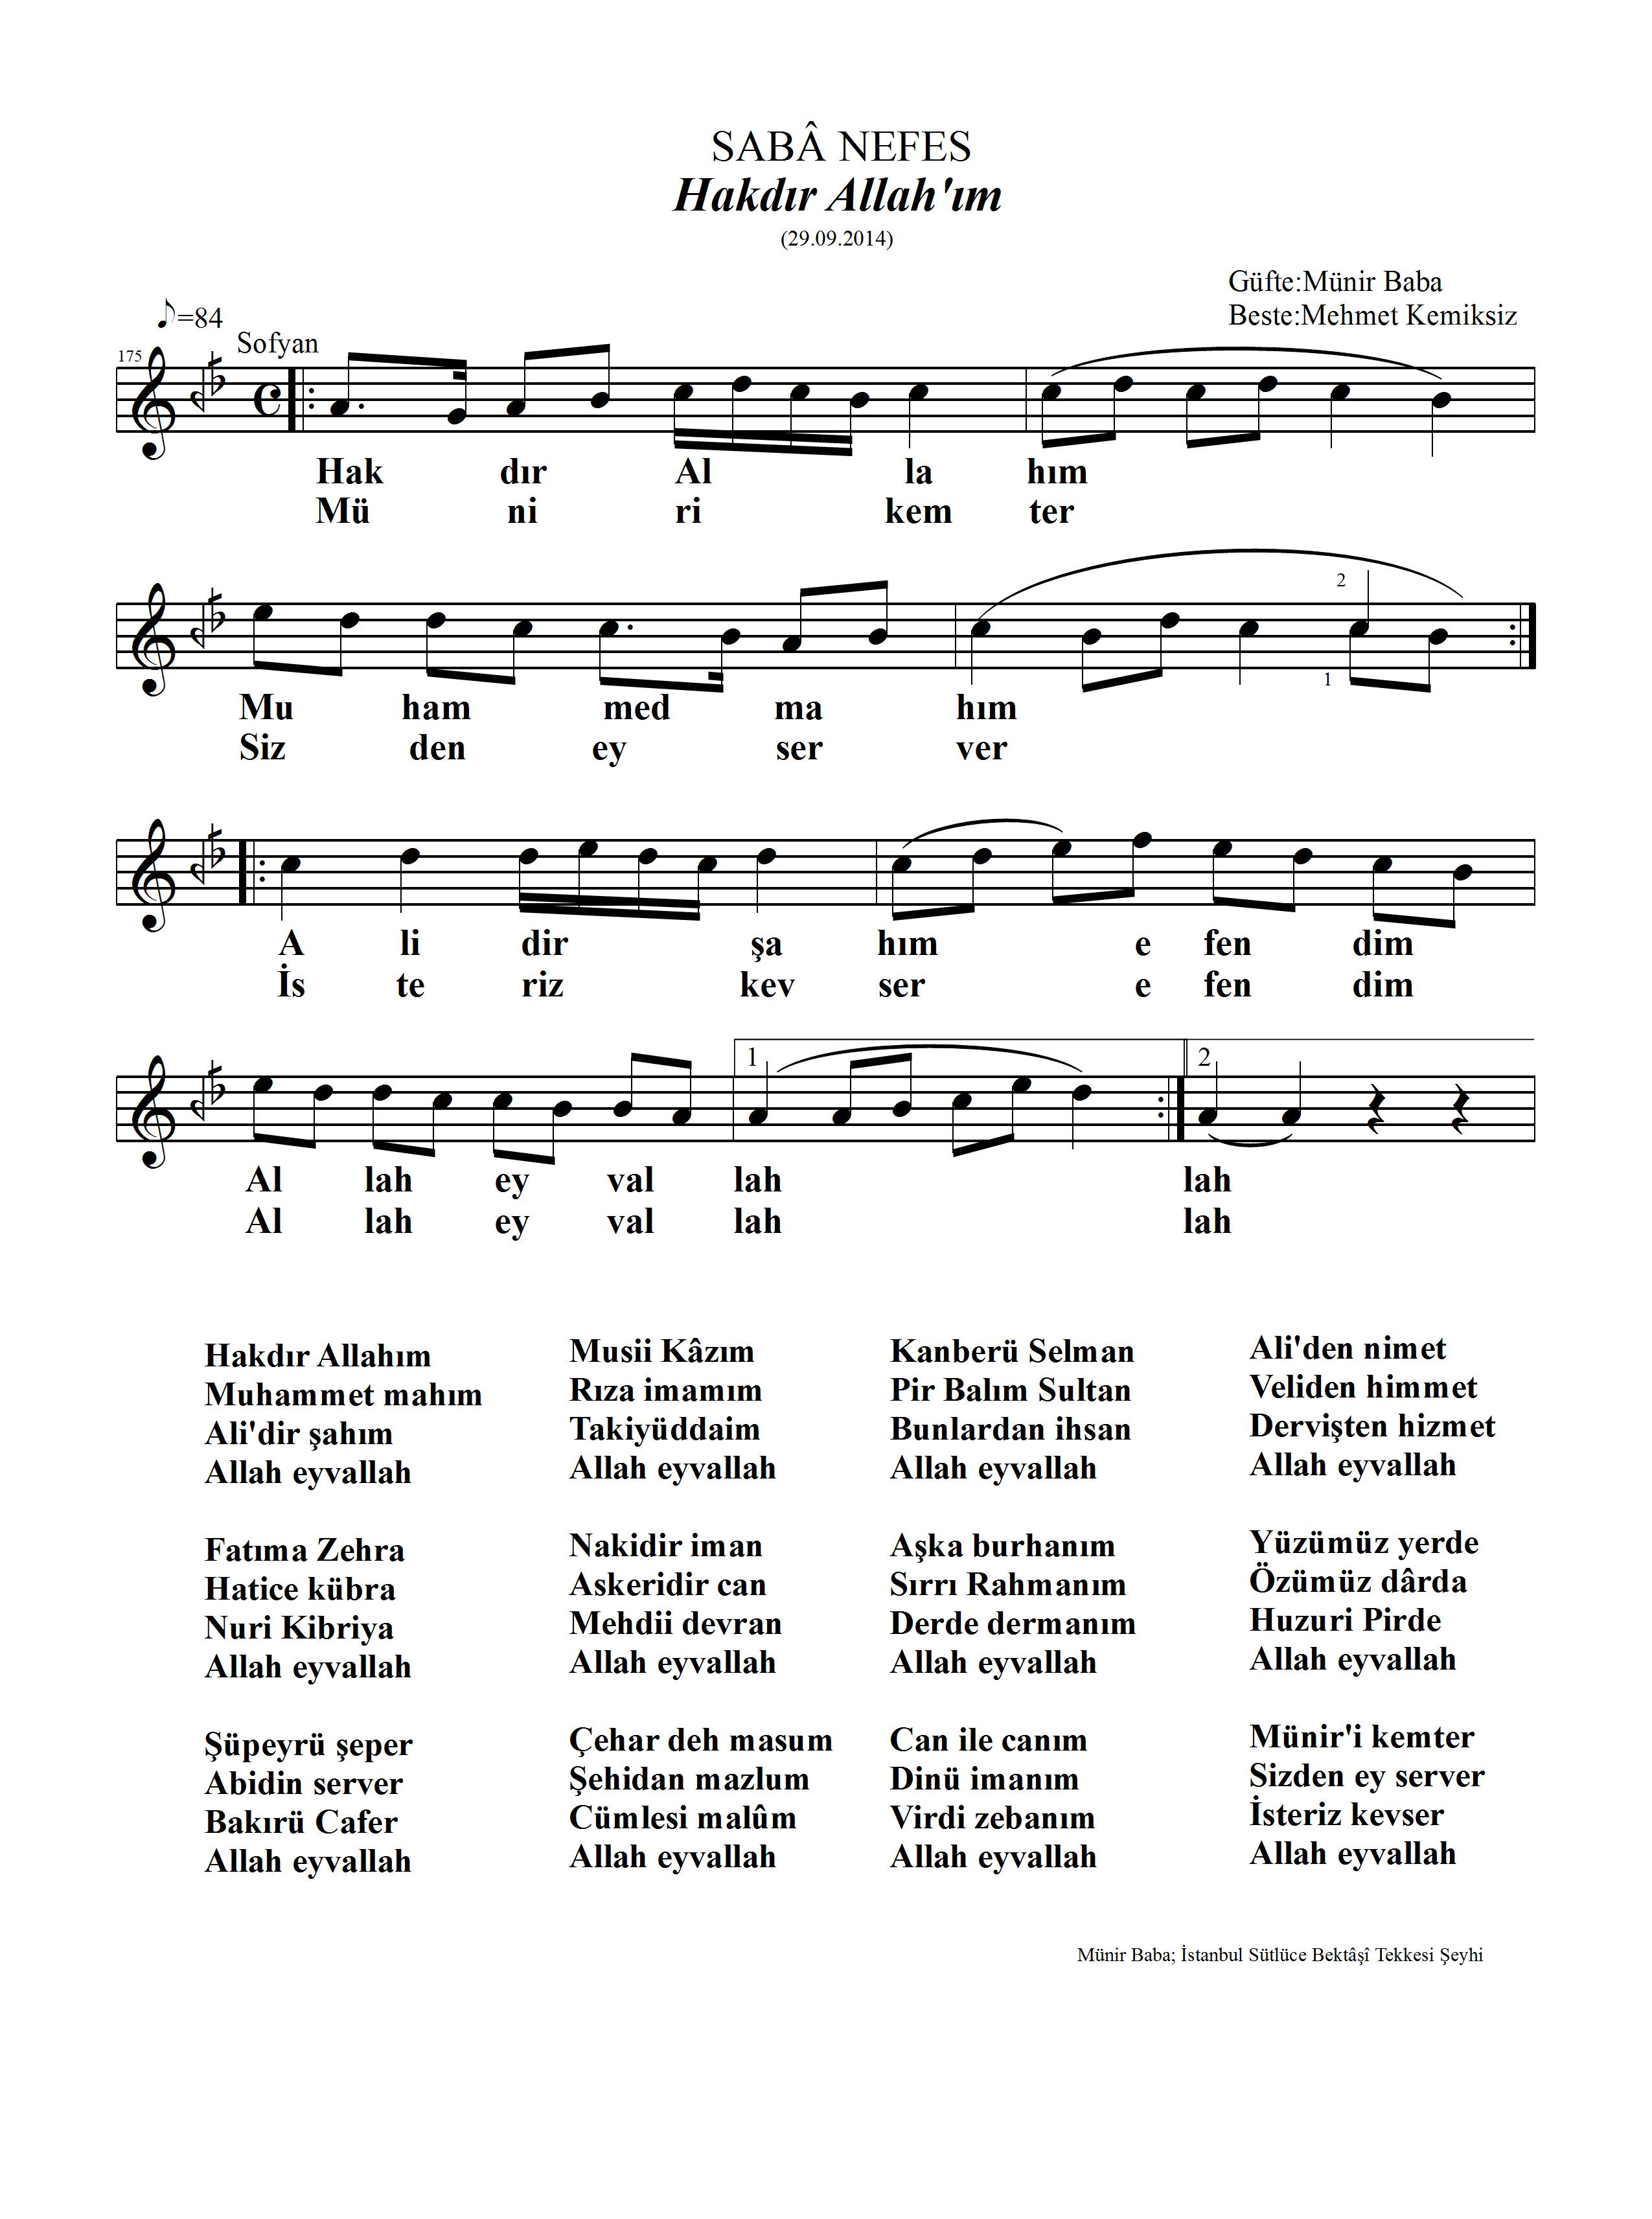 175-Saba-Hakdir Allahim